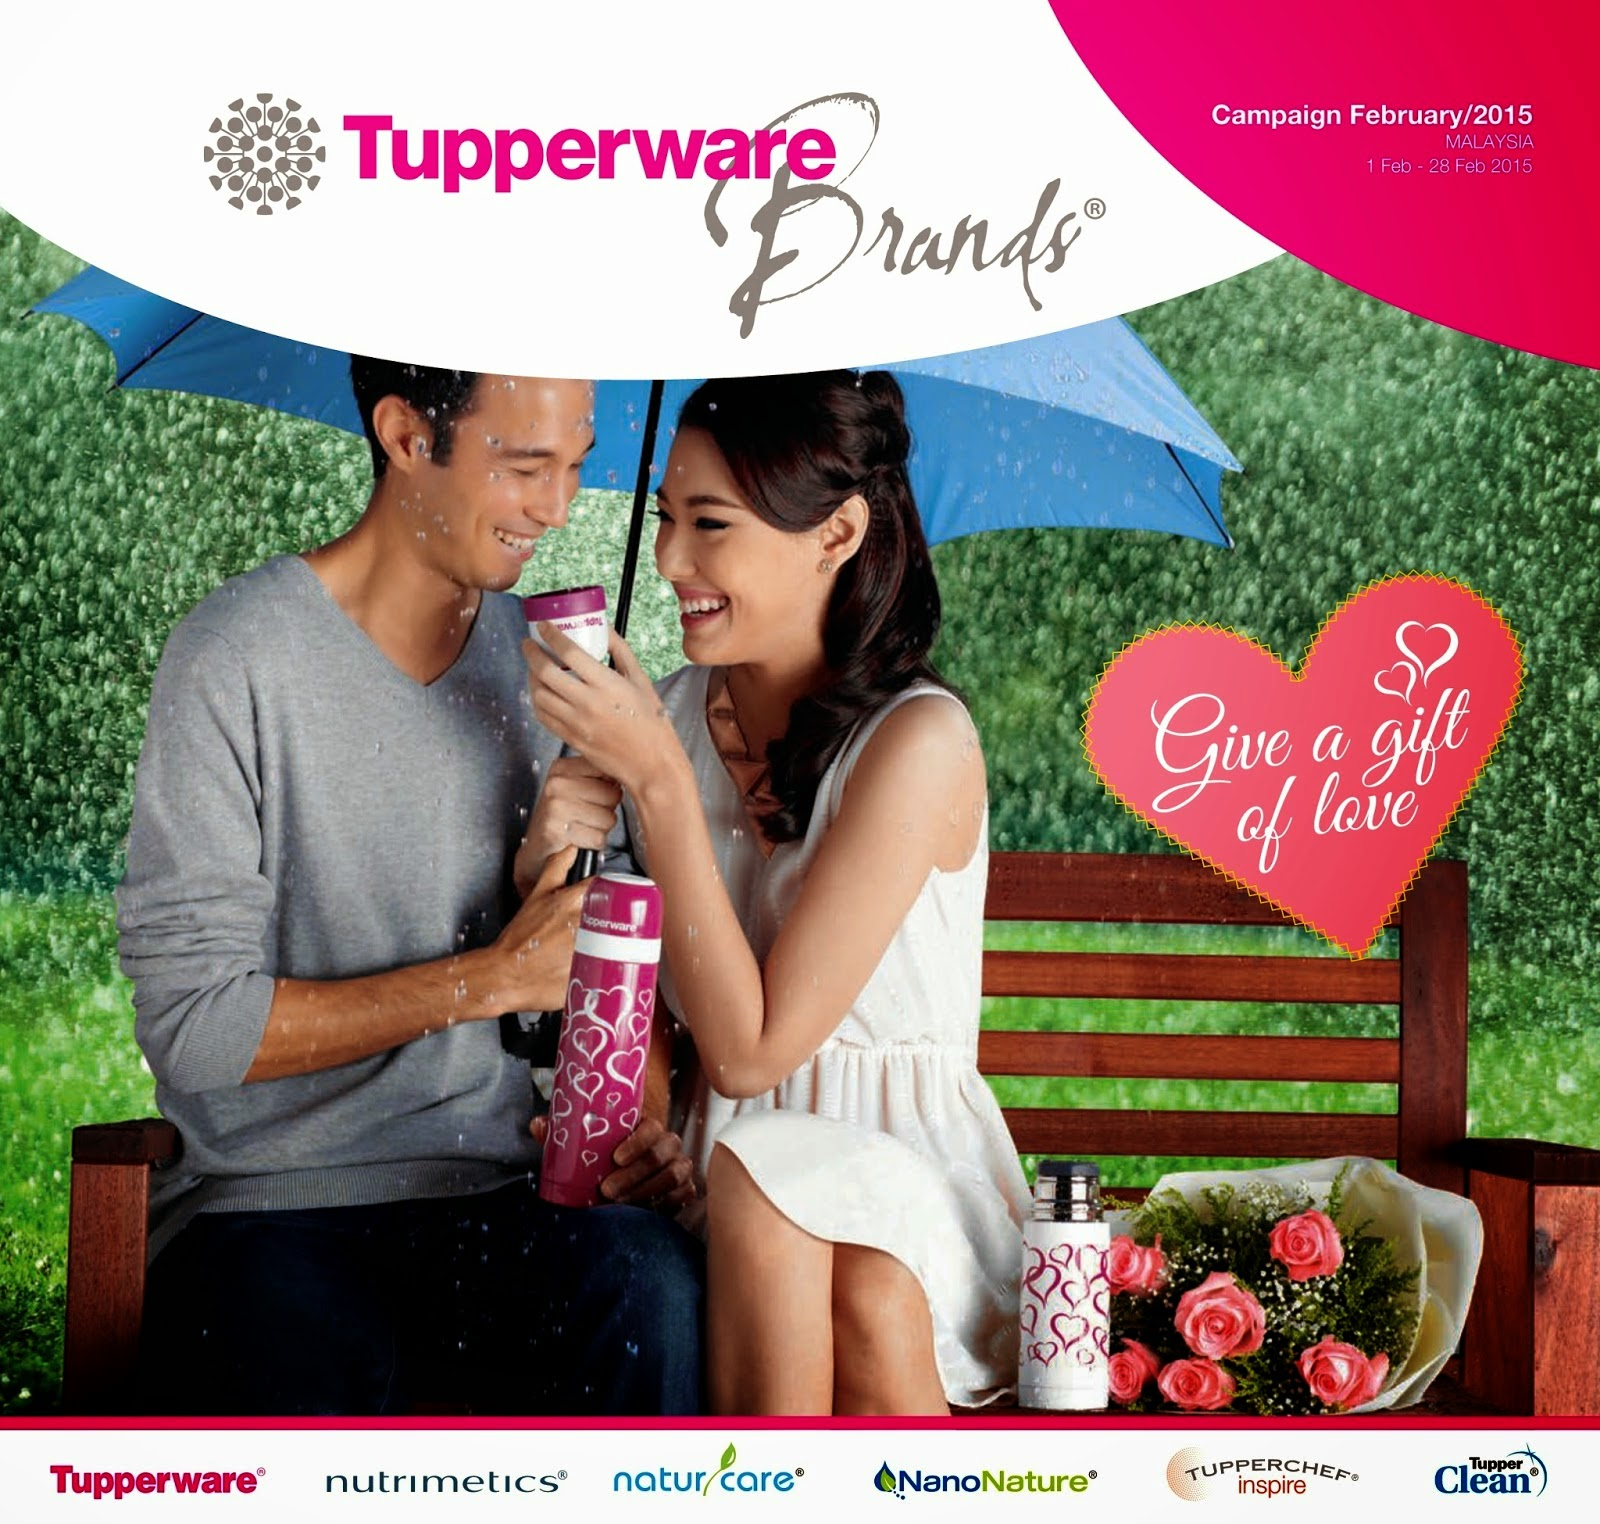 http://kinslifestyle.blogspot.com/p/tupperware-brands.html